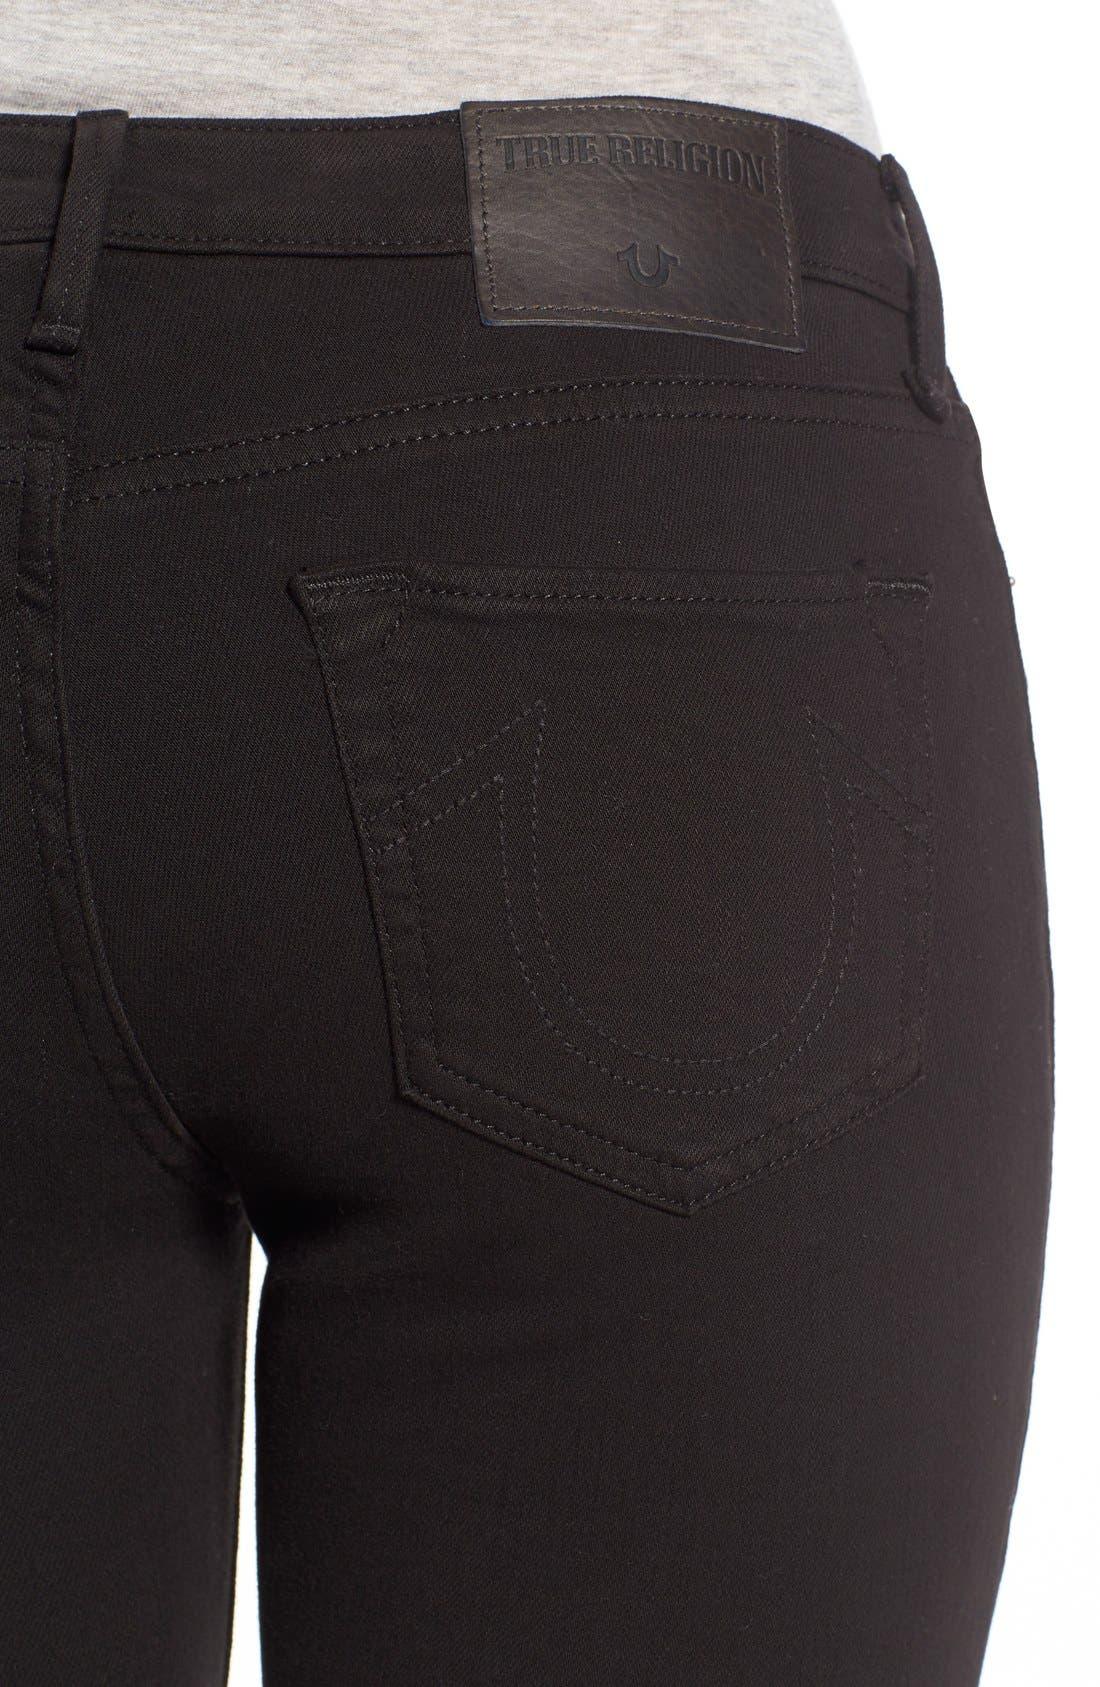 'Halle' Skinny Jeans,                             Alternate thumbnail 4, color,